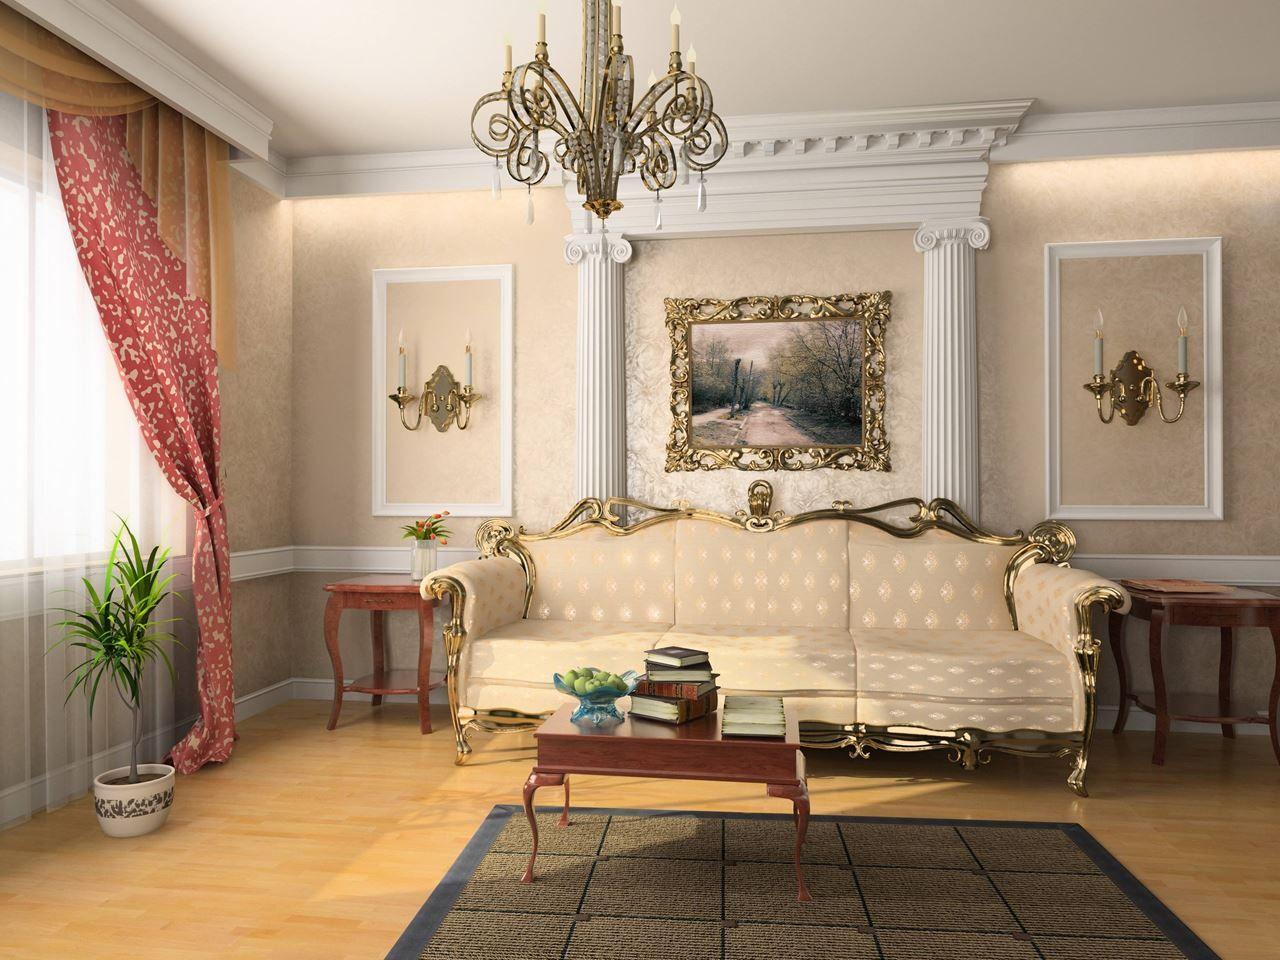 Stupendous Rococo Style Interior Design Decor Wanted Rococo Rococo Download Free Architecture Designs Sospemadebymaigaardcom